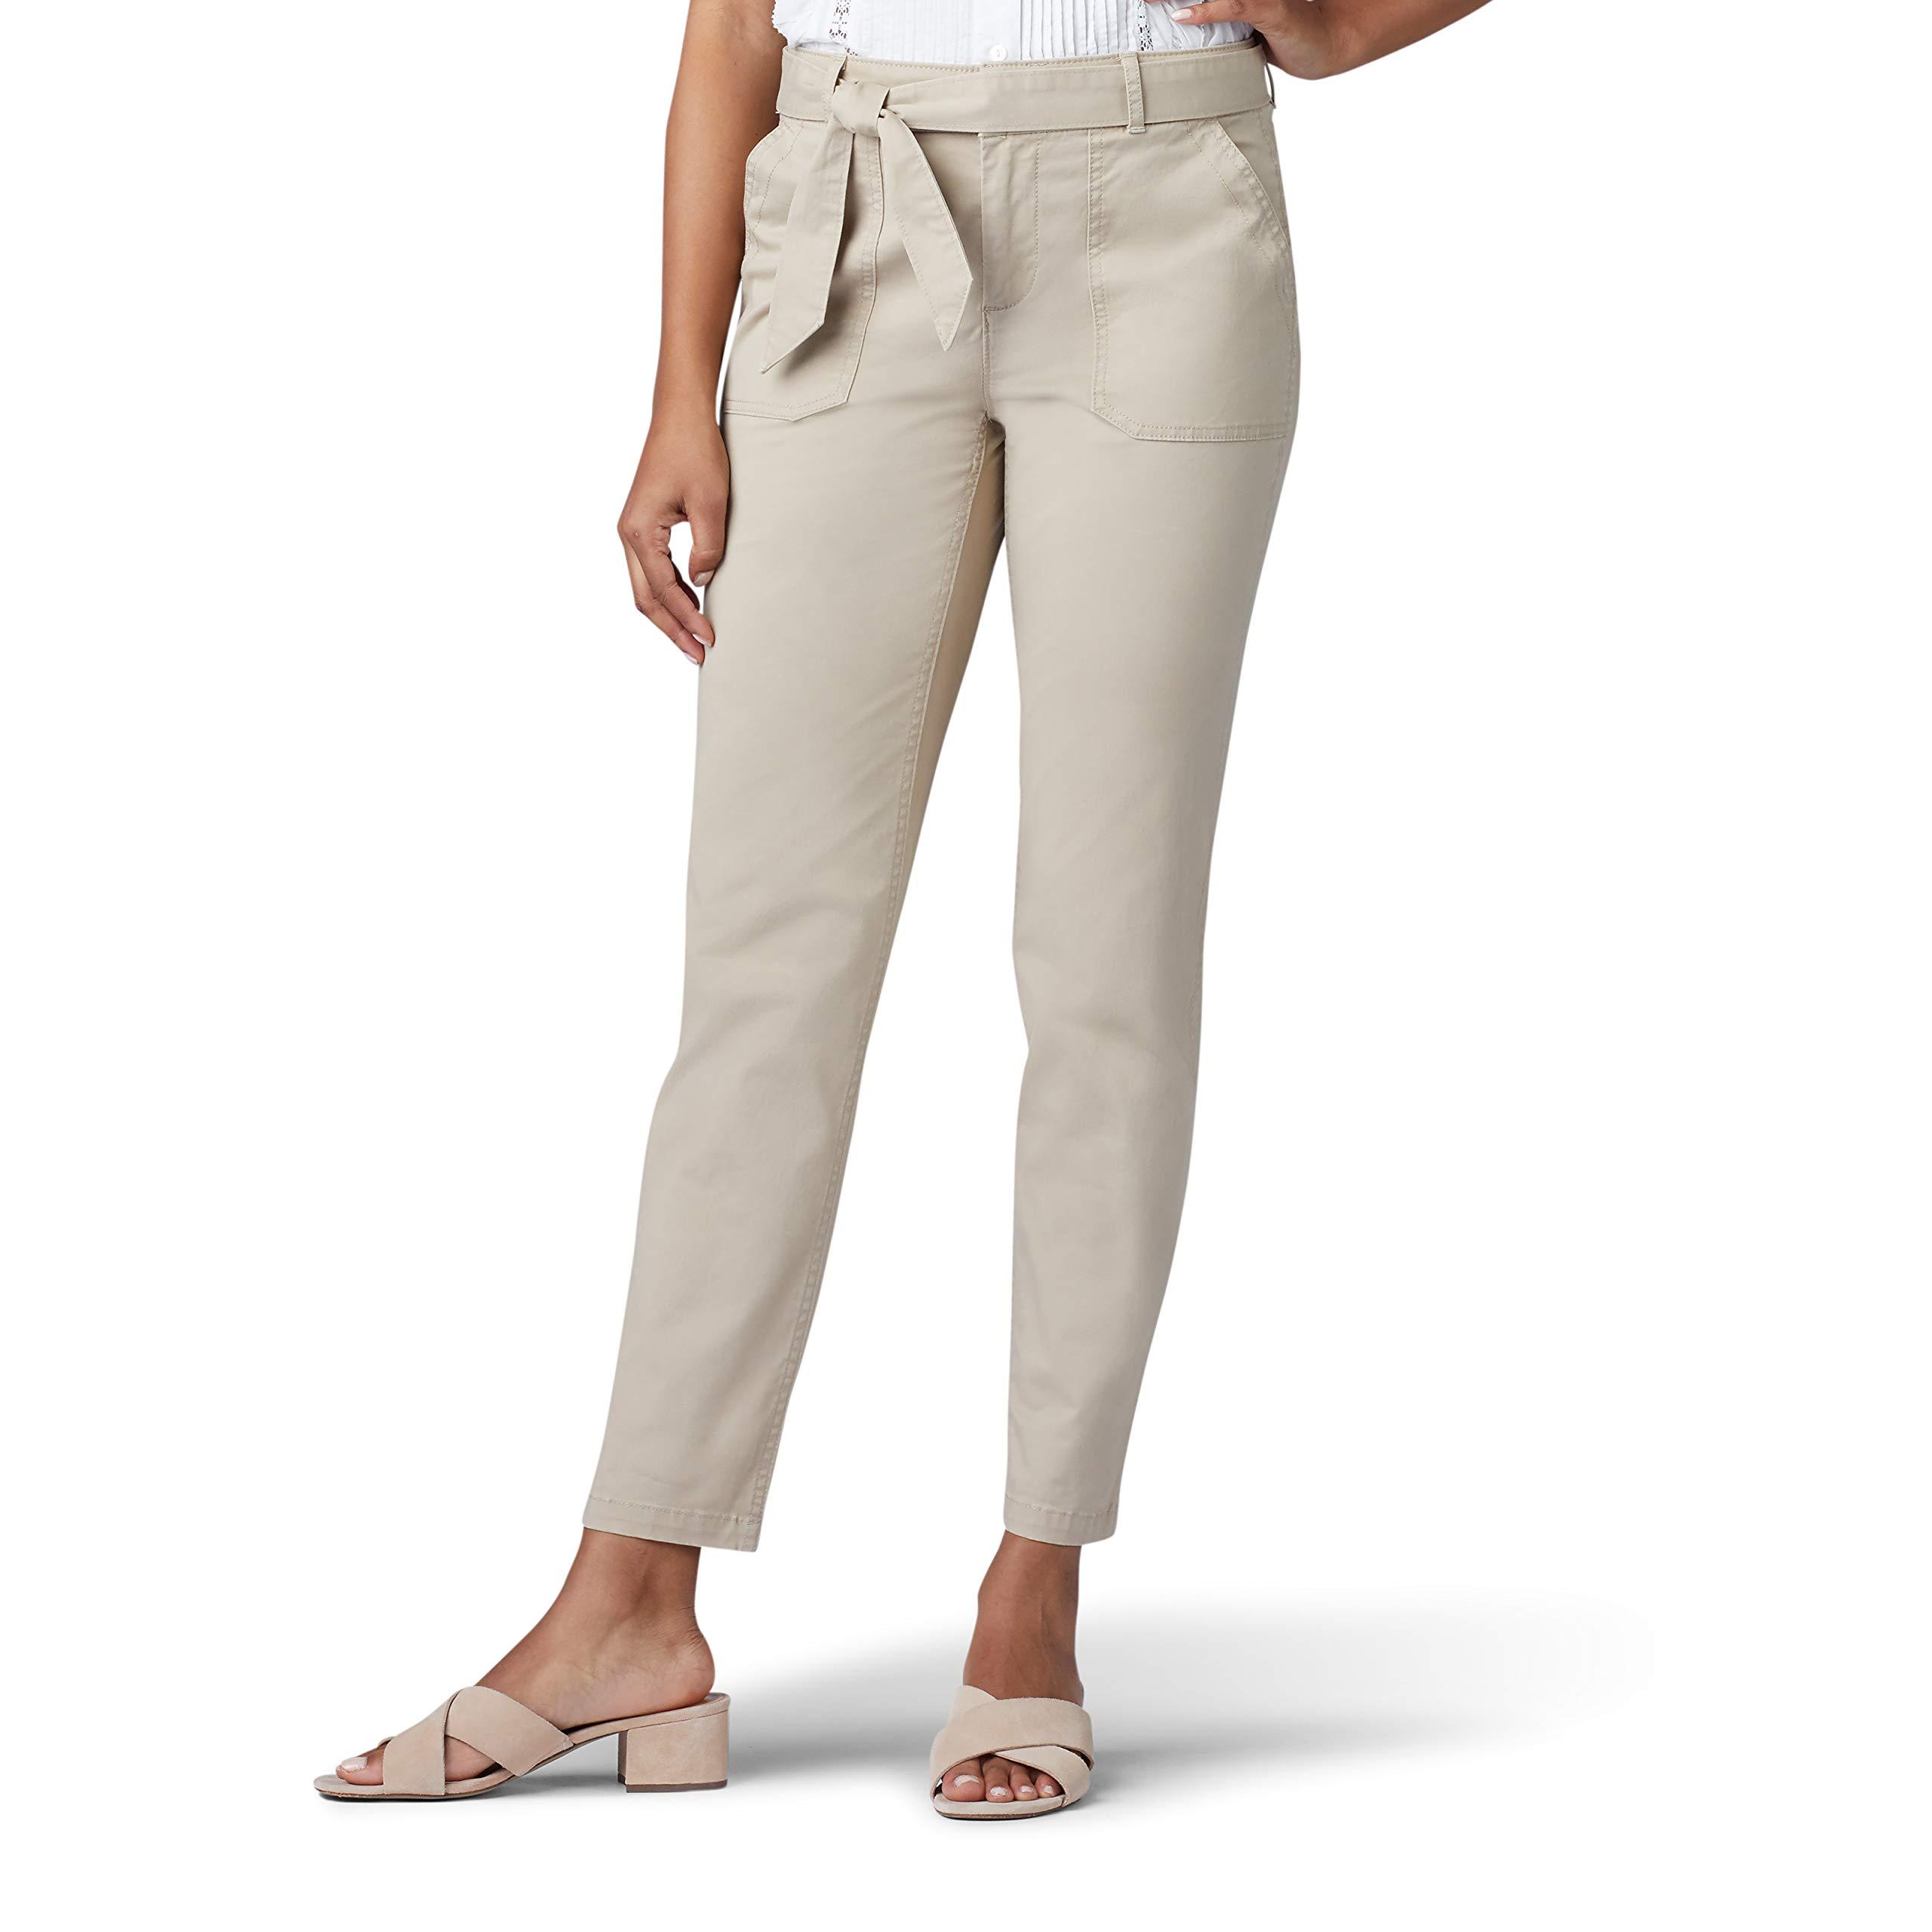 Lee Uniforms Women's Regular Fit Straight Leg Utility Ankle Pant